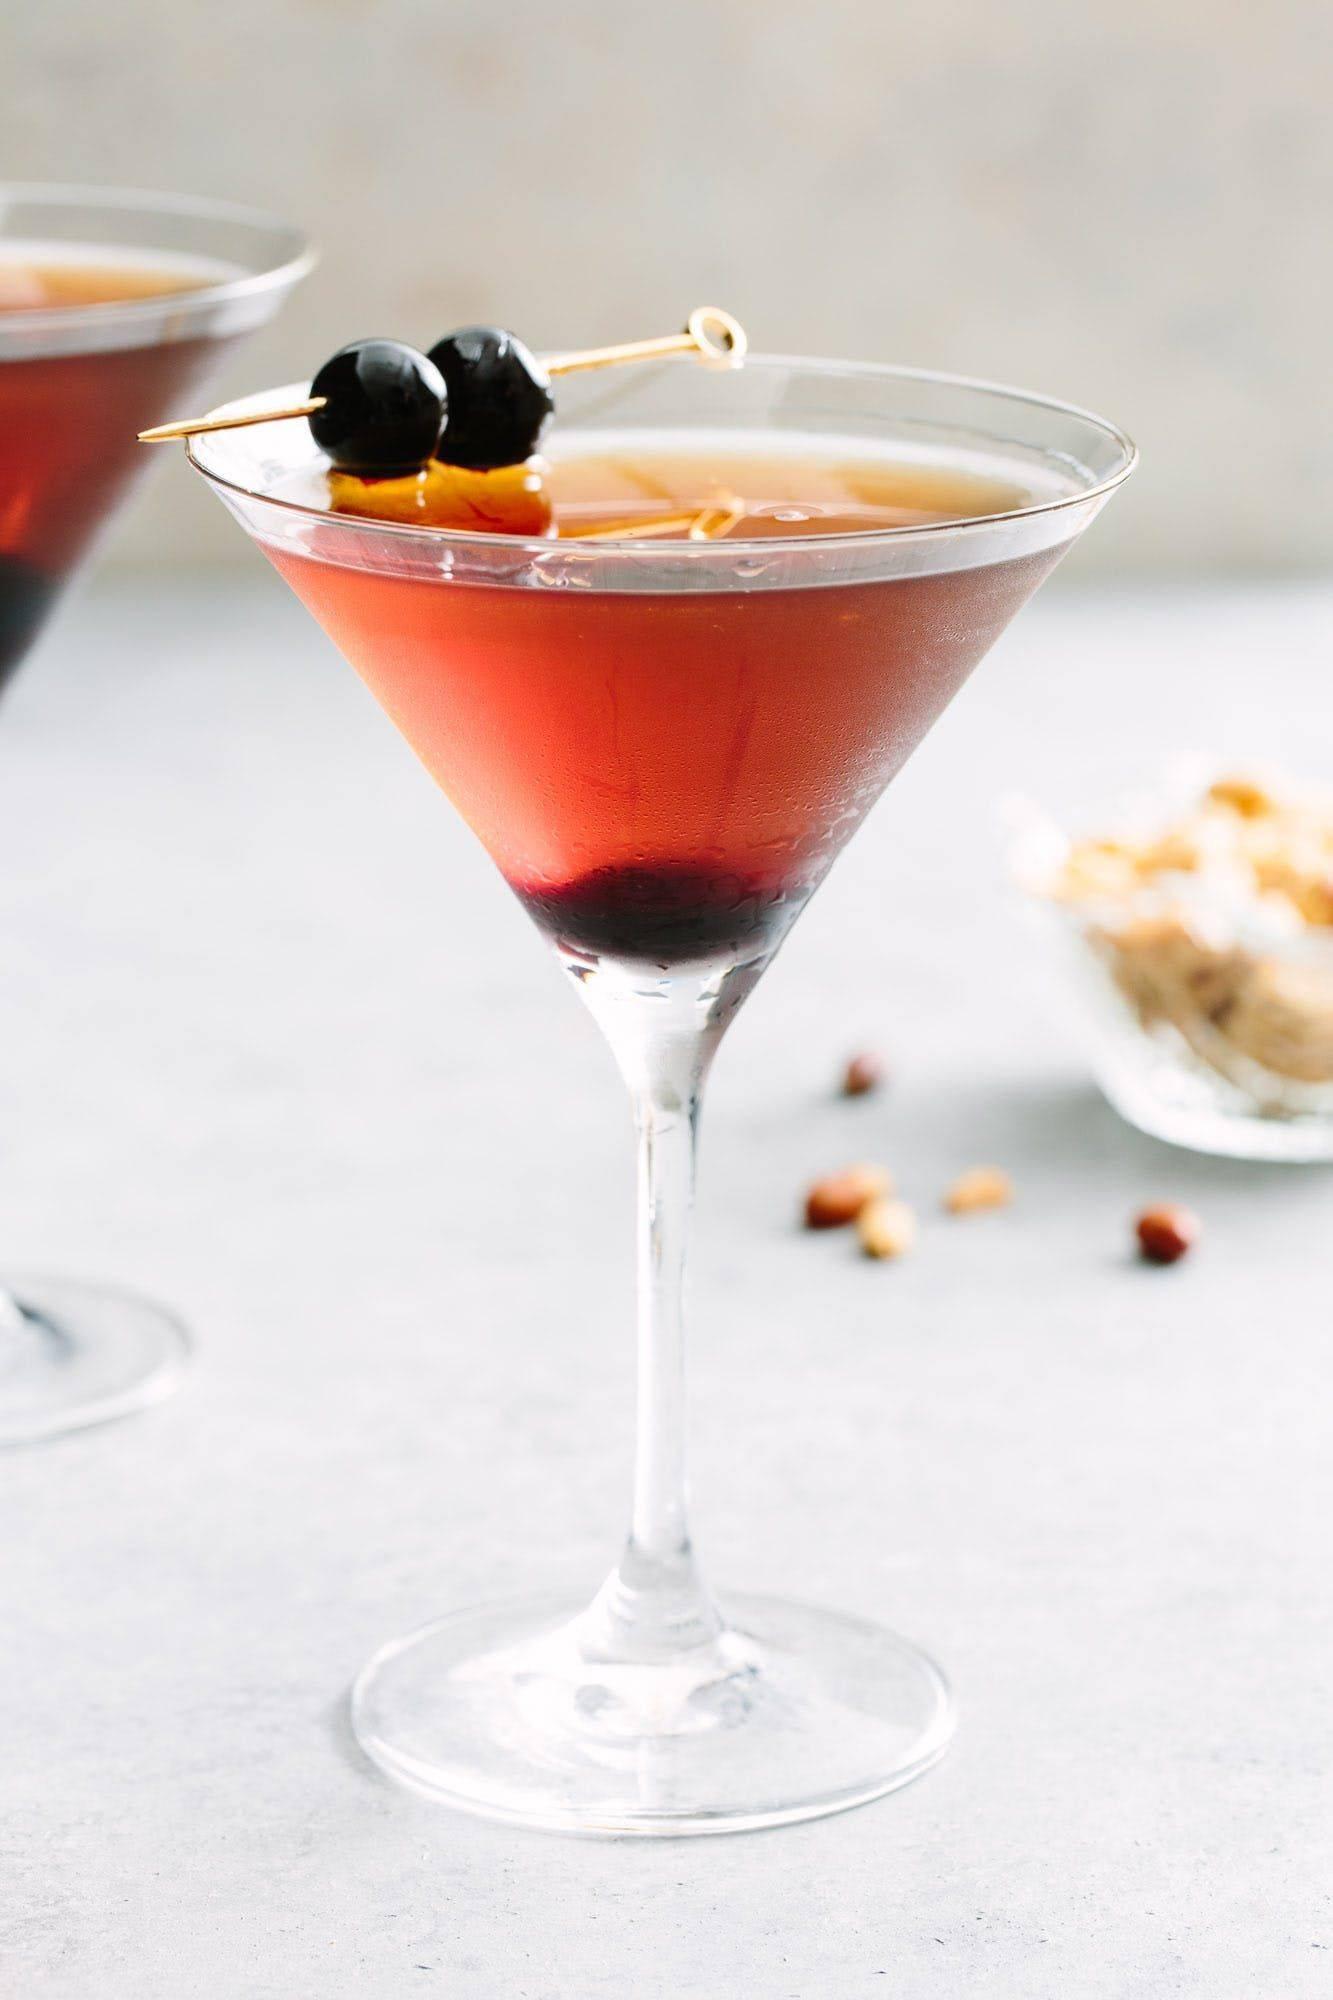 Рецепты приготовления коктейля манхэттен